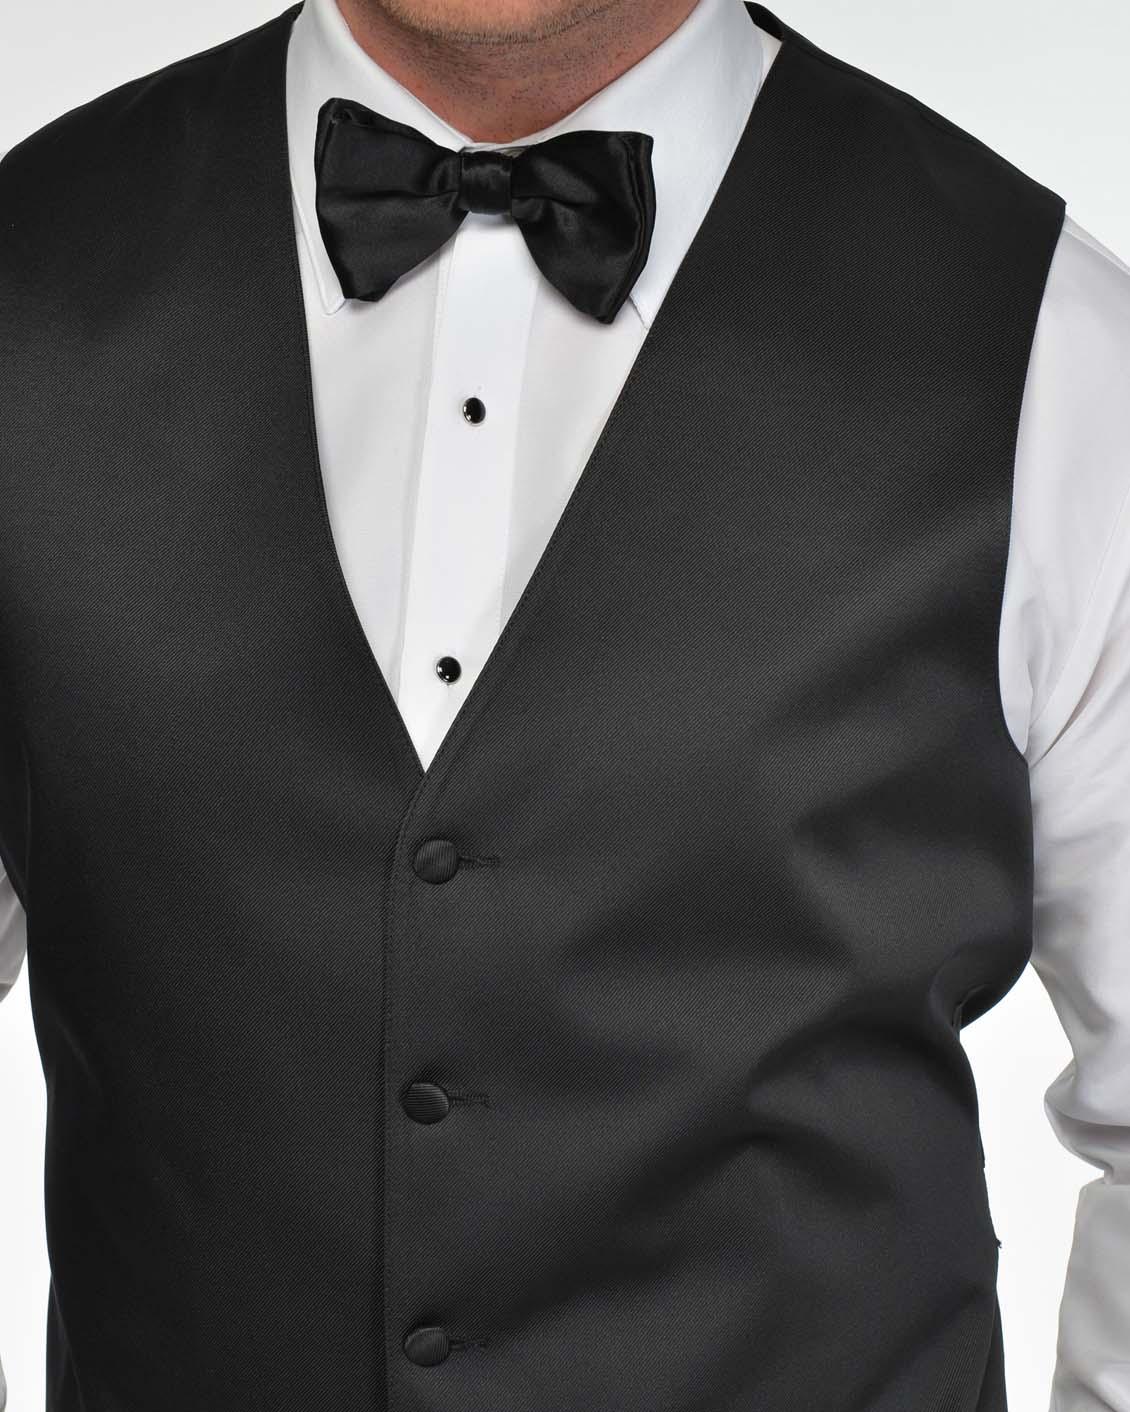 Tuxedo.ca - Black Satin Vest